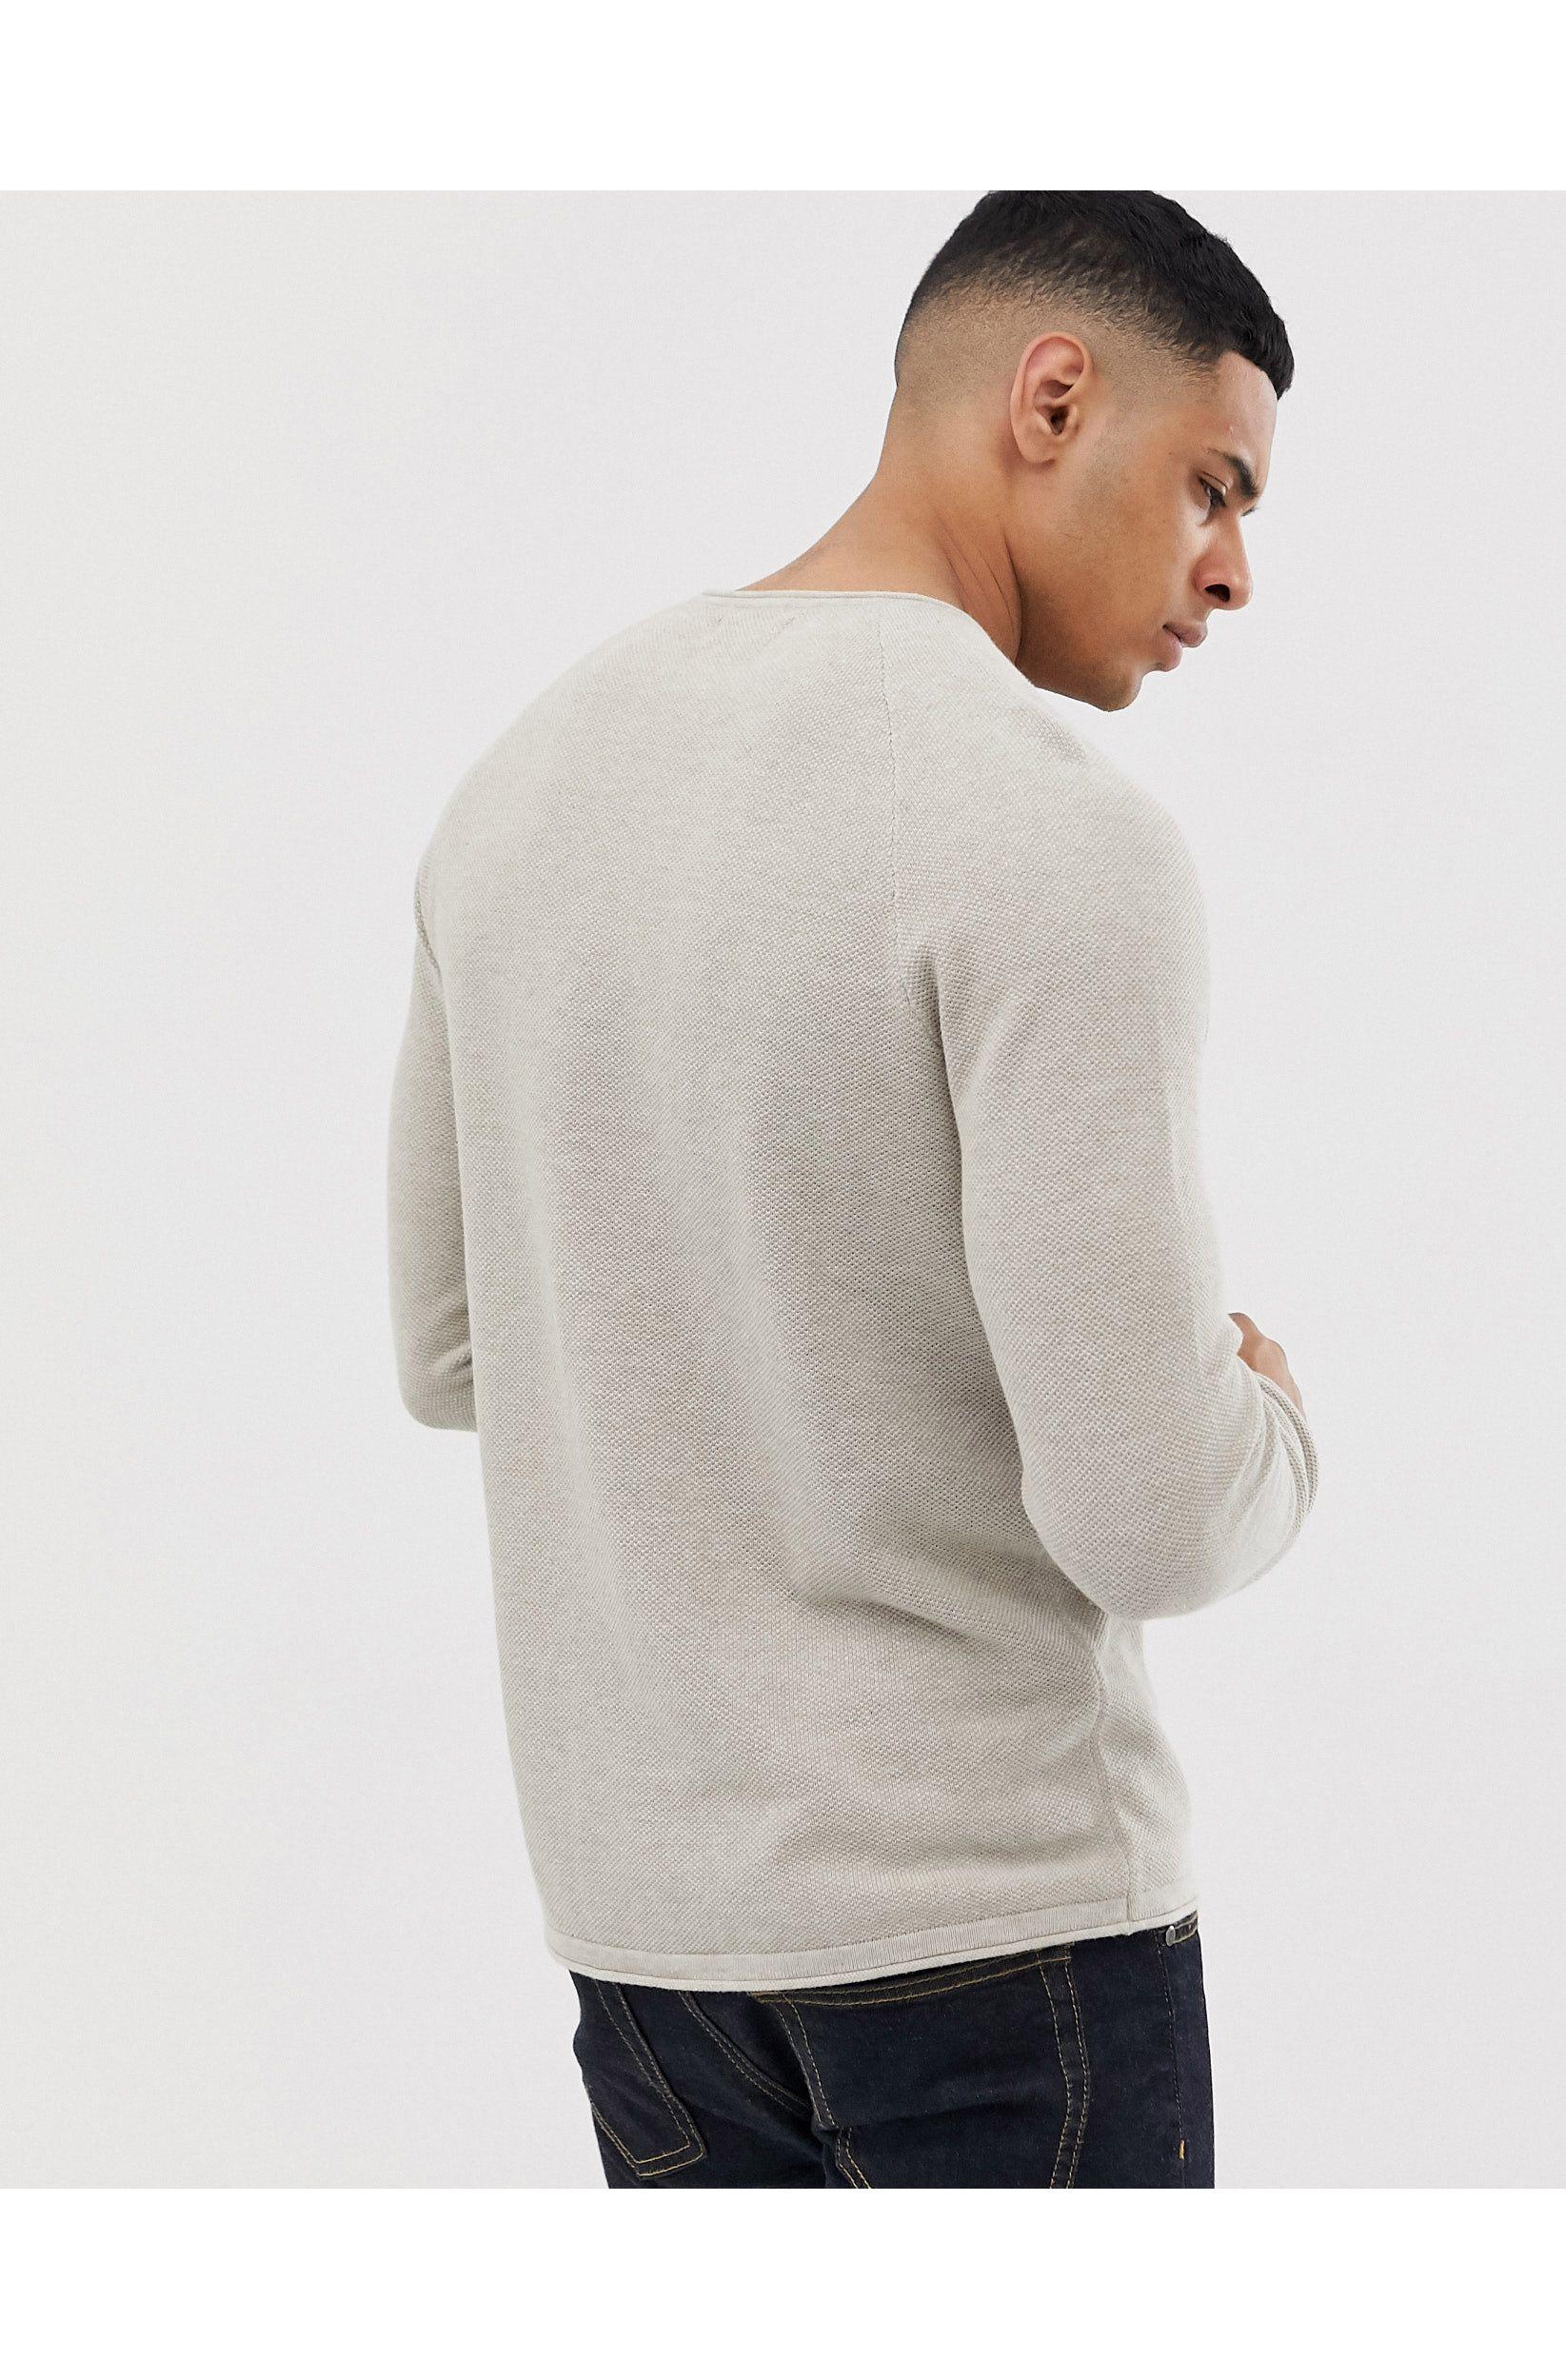 Jack and Jones Mens Half Logo Crew Sweater Jumper Pullover